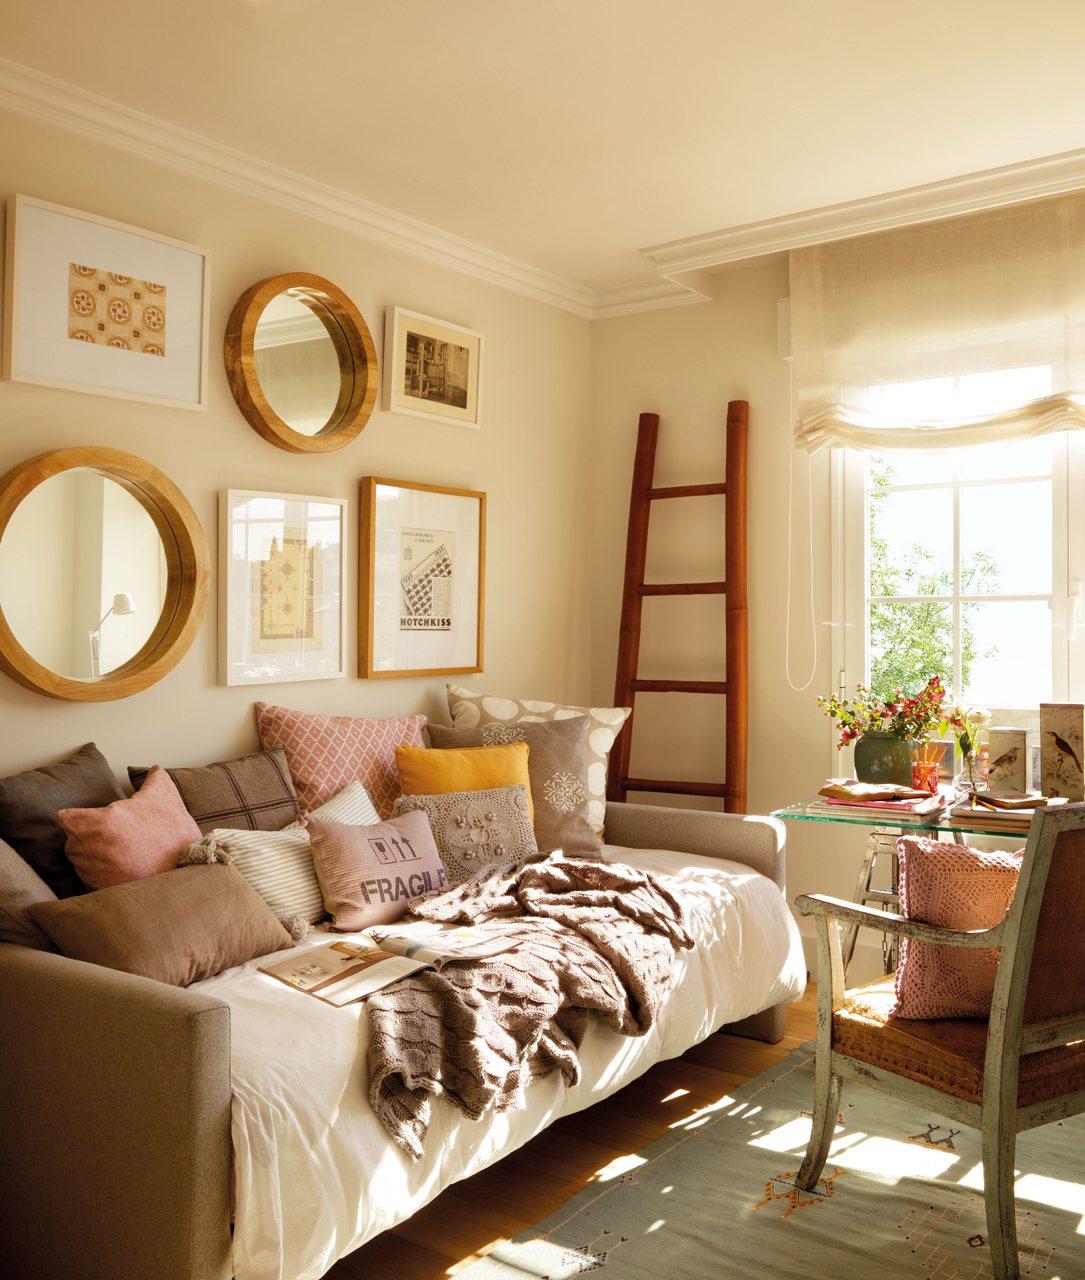 Primer piso de la interiorista Beatriz Silveira